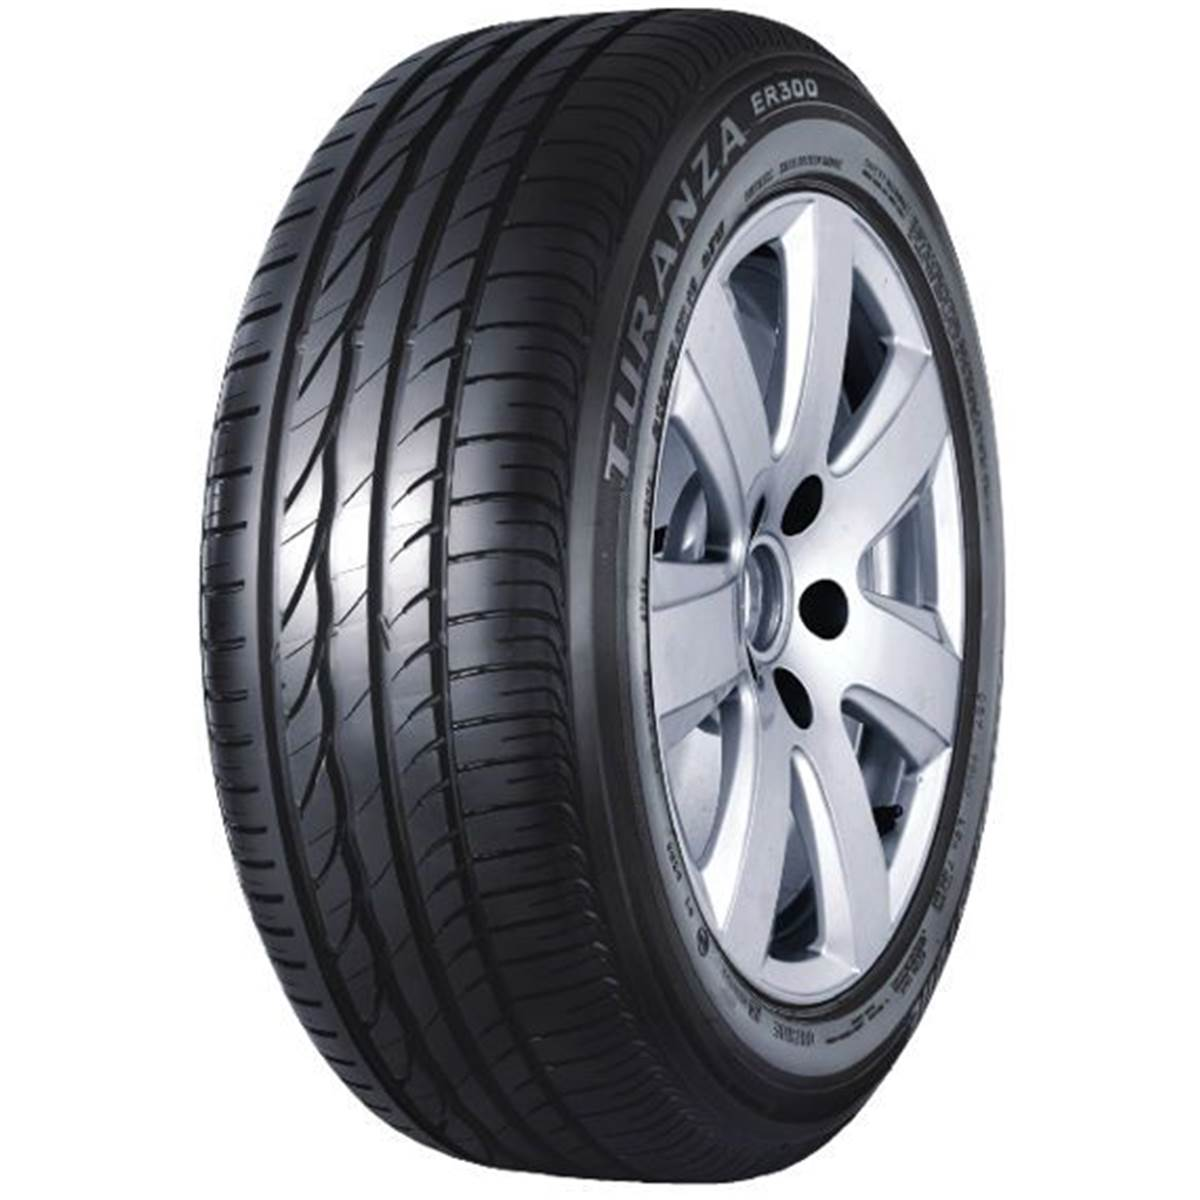 Pneu Bridgestone 225/55R17 97Y TURANZA ER300